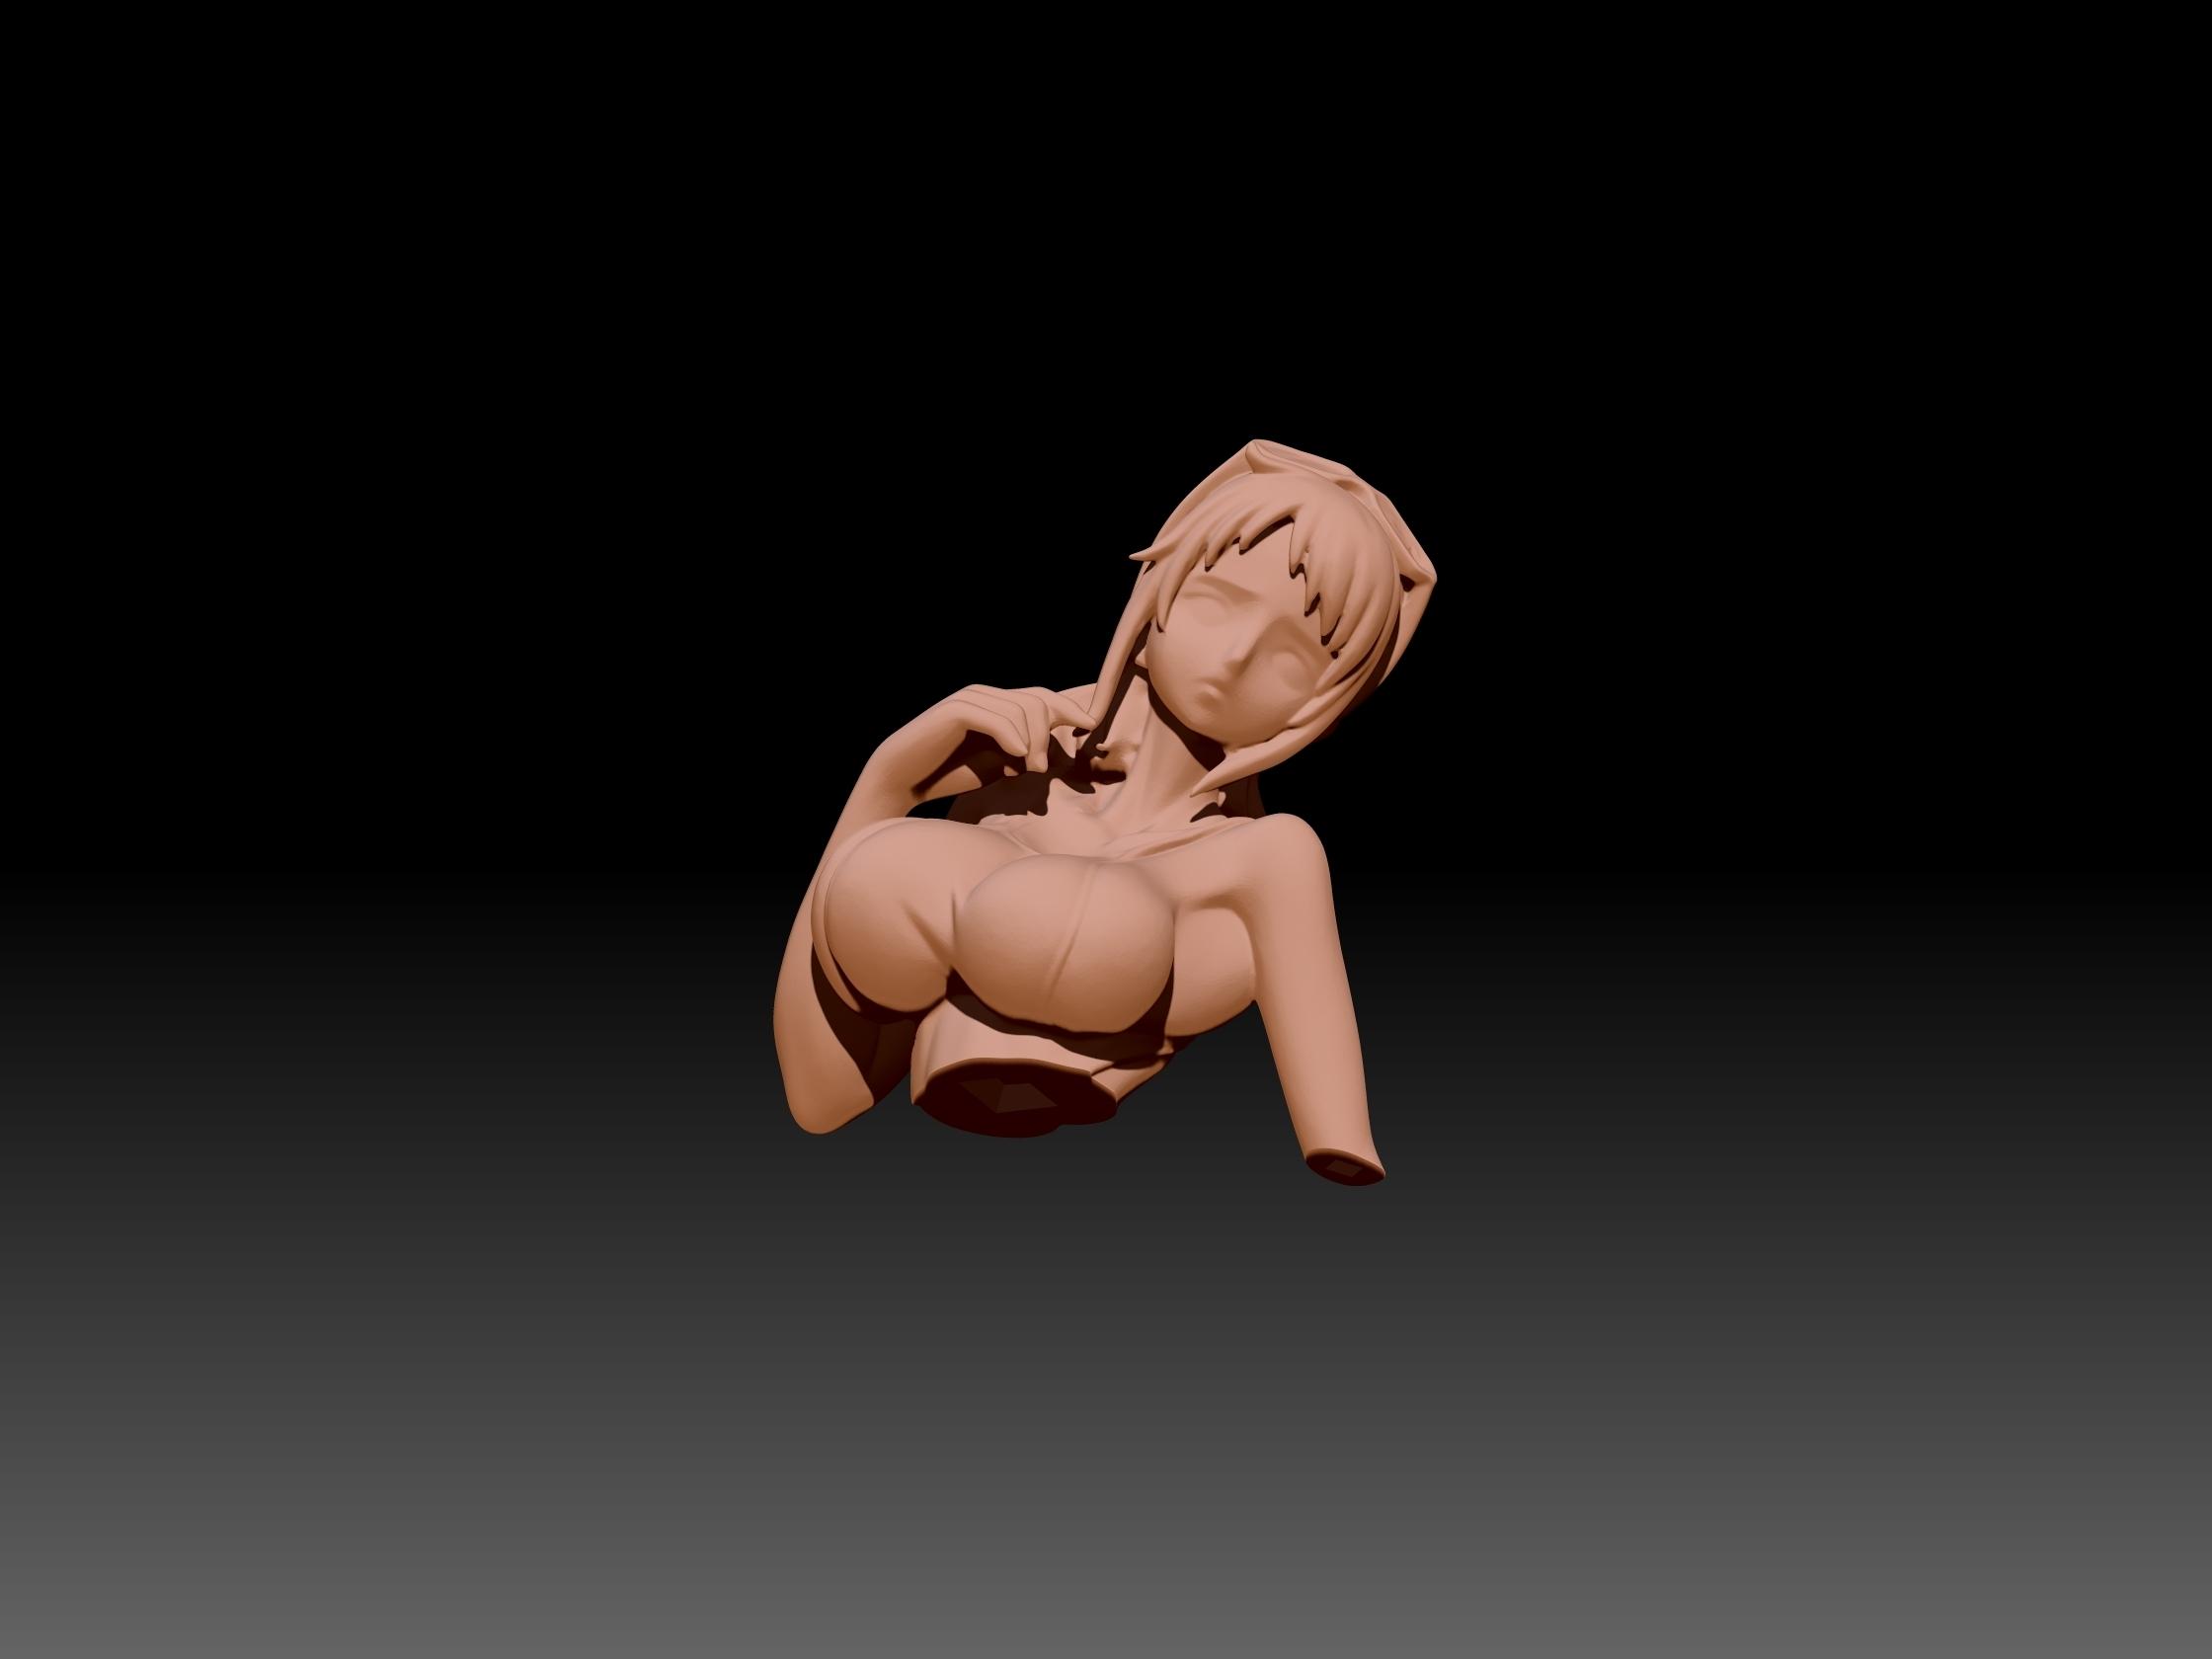 ZBrush Document3.jpg Download STL file one piece tashigi • Design to 3D print, Geraldart